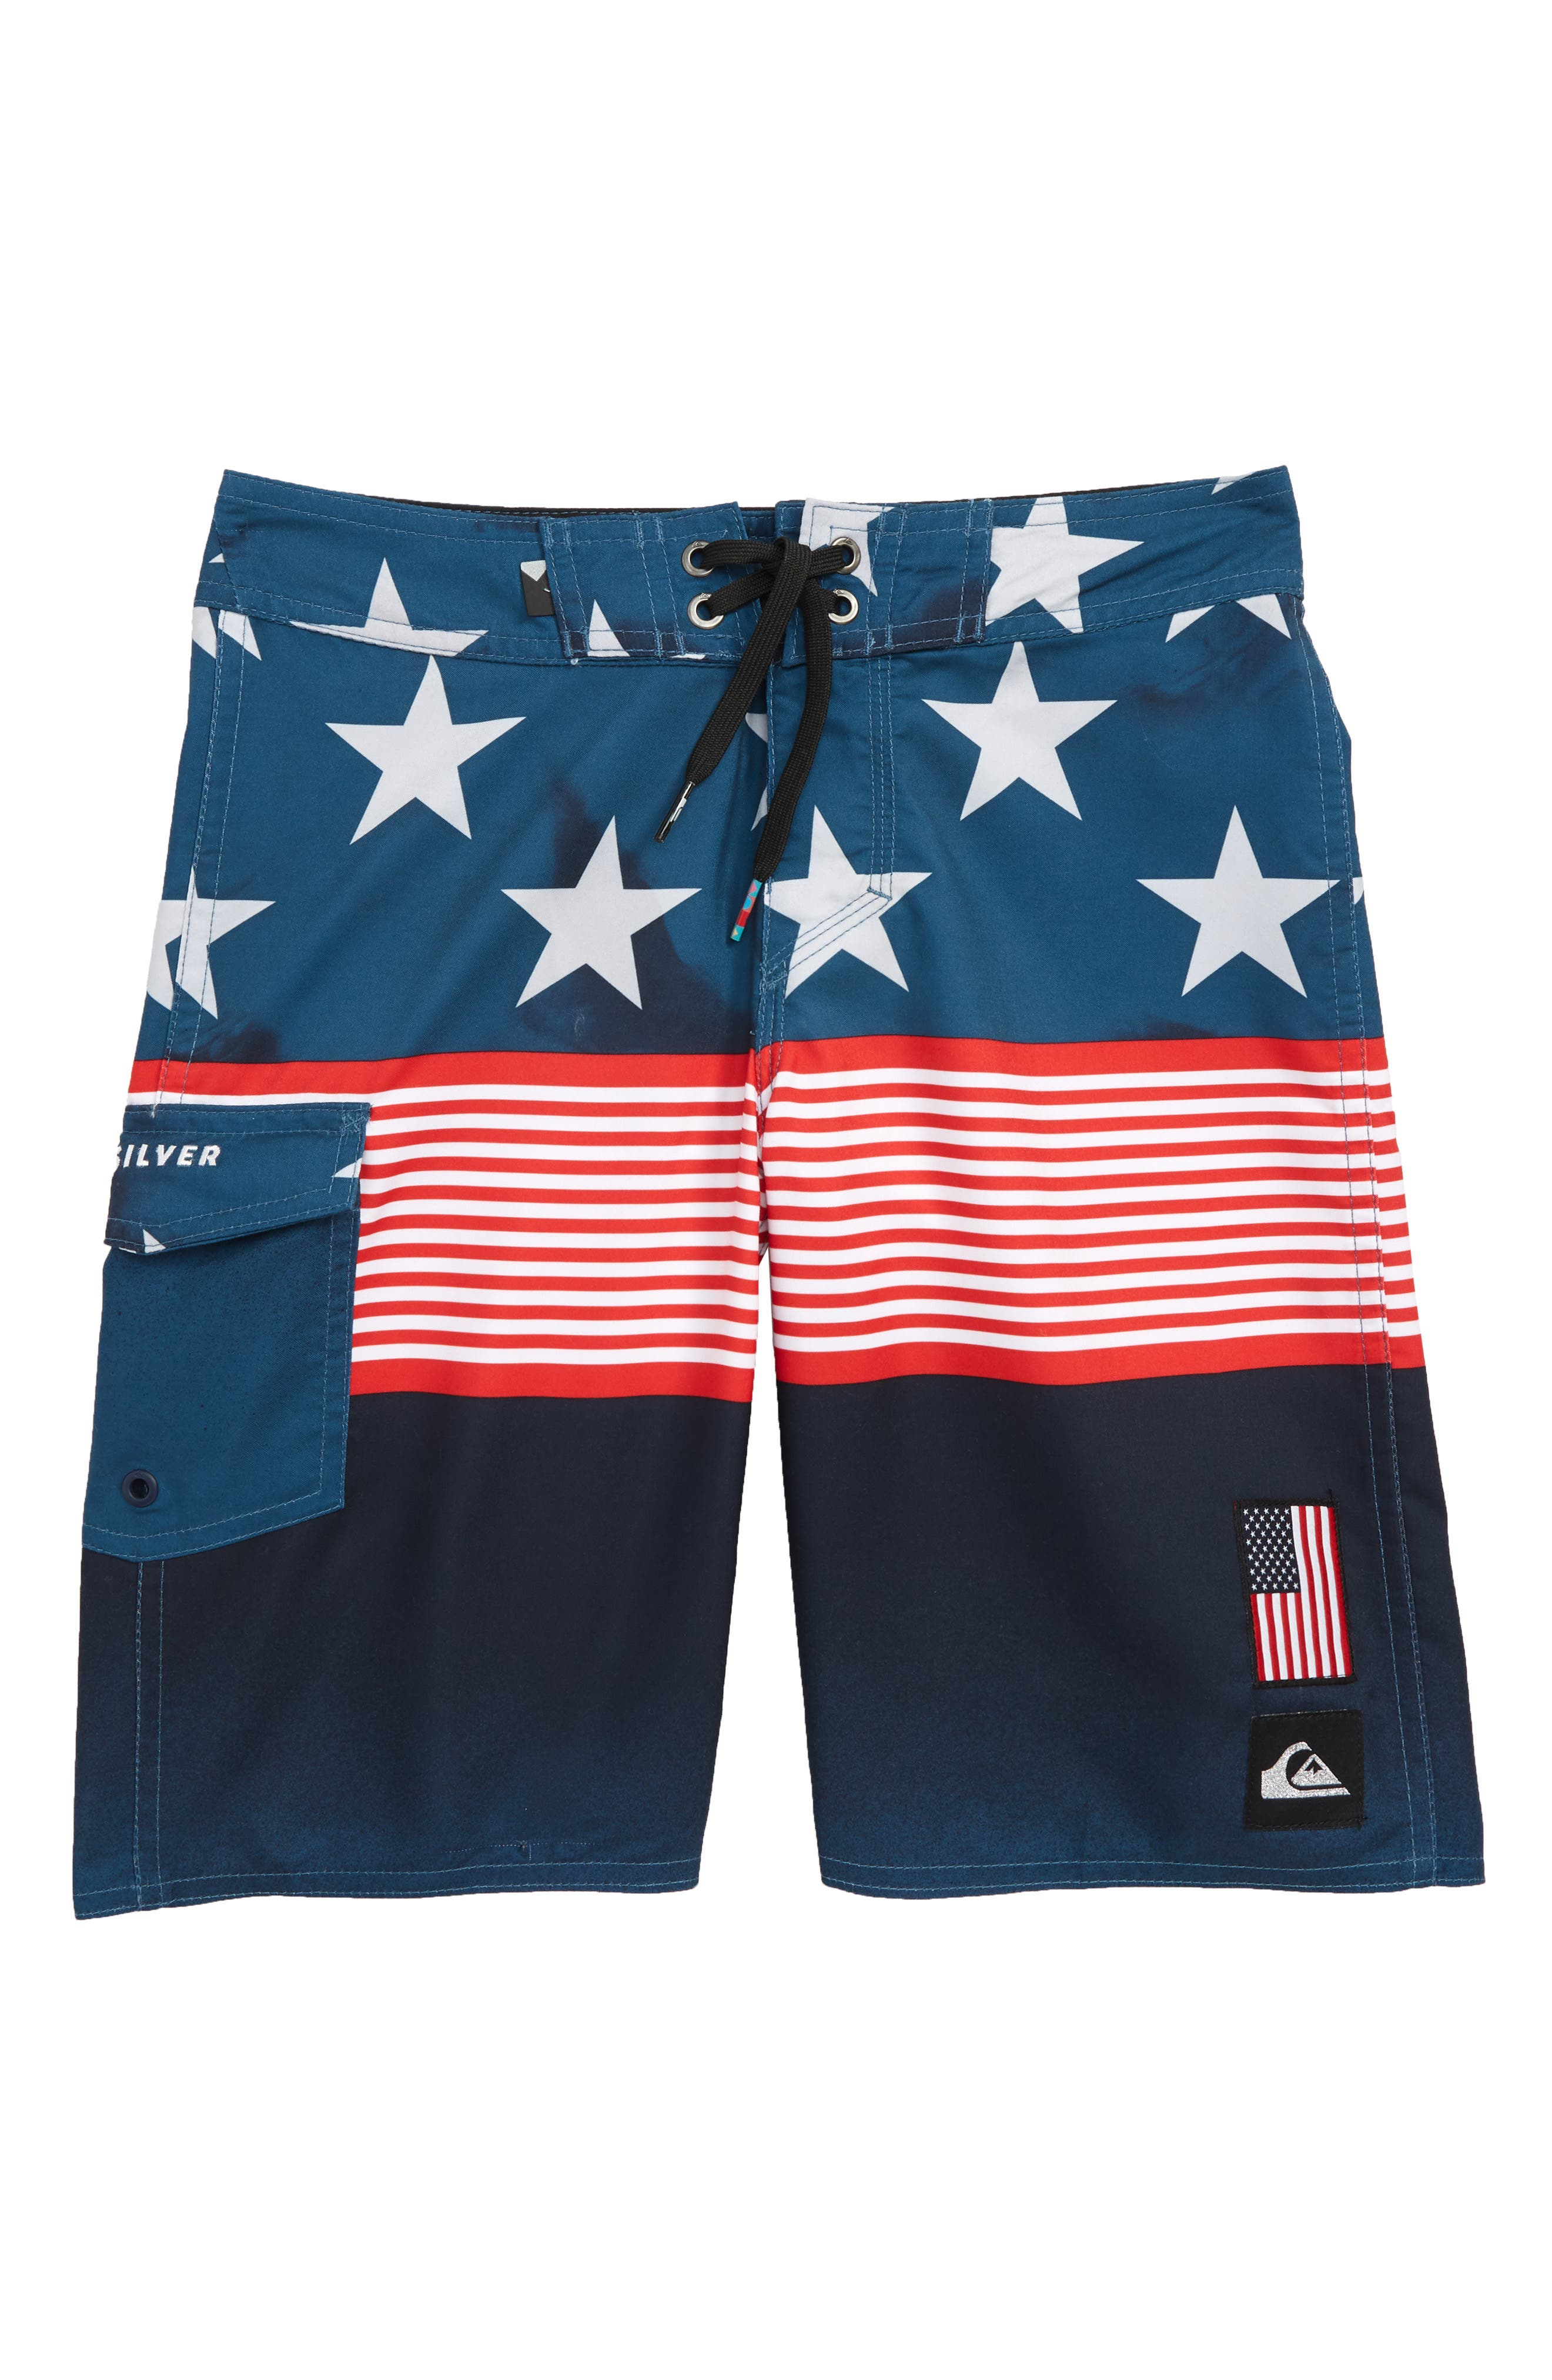 Division Independent Board Shorts,                         Main,                         color, Navy Blazer